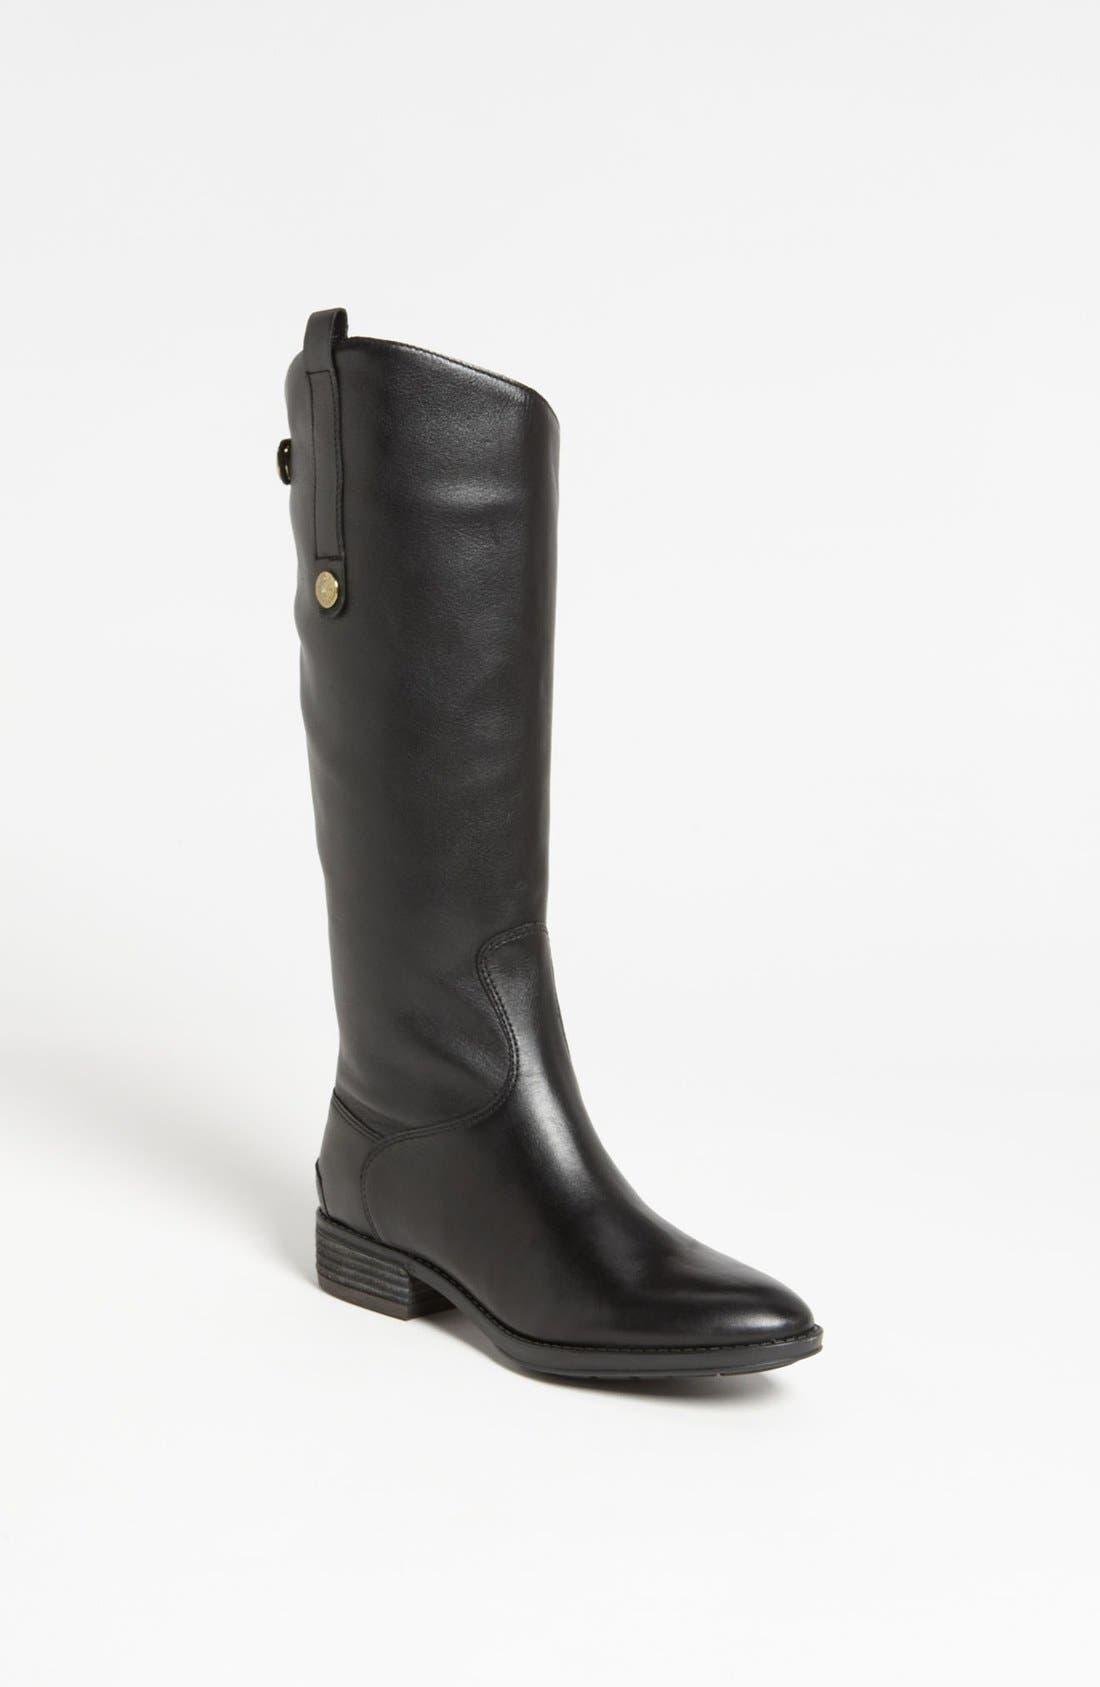 Alternate Image 1 Selected - Sam Edelman 'Penny' Boot (Women) (Wide Calf)